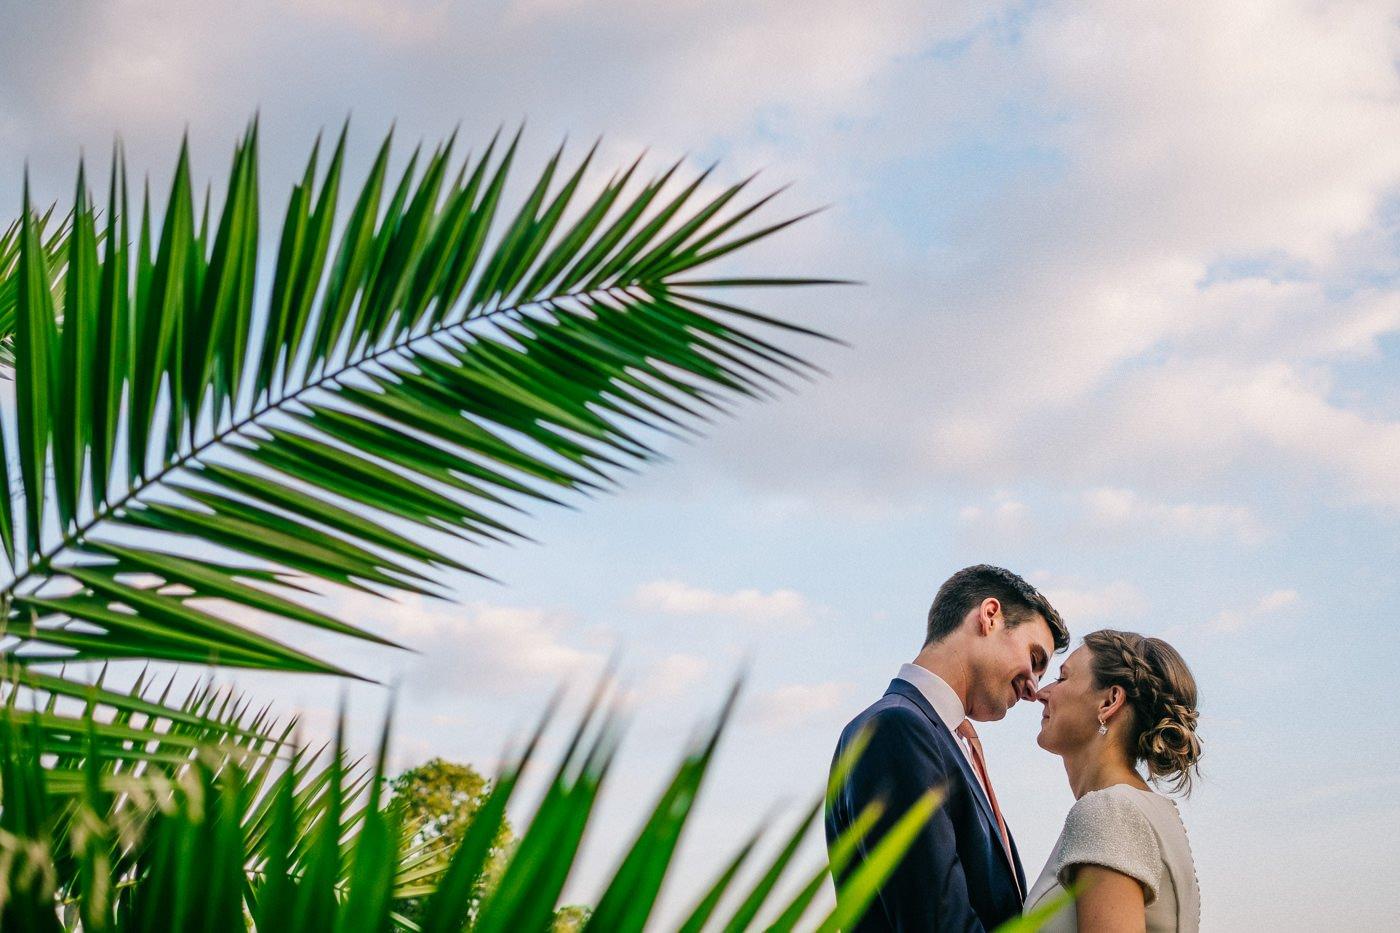 Alternative wedding photographer humanist wedding